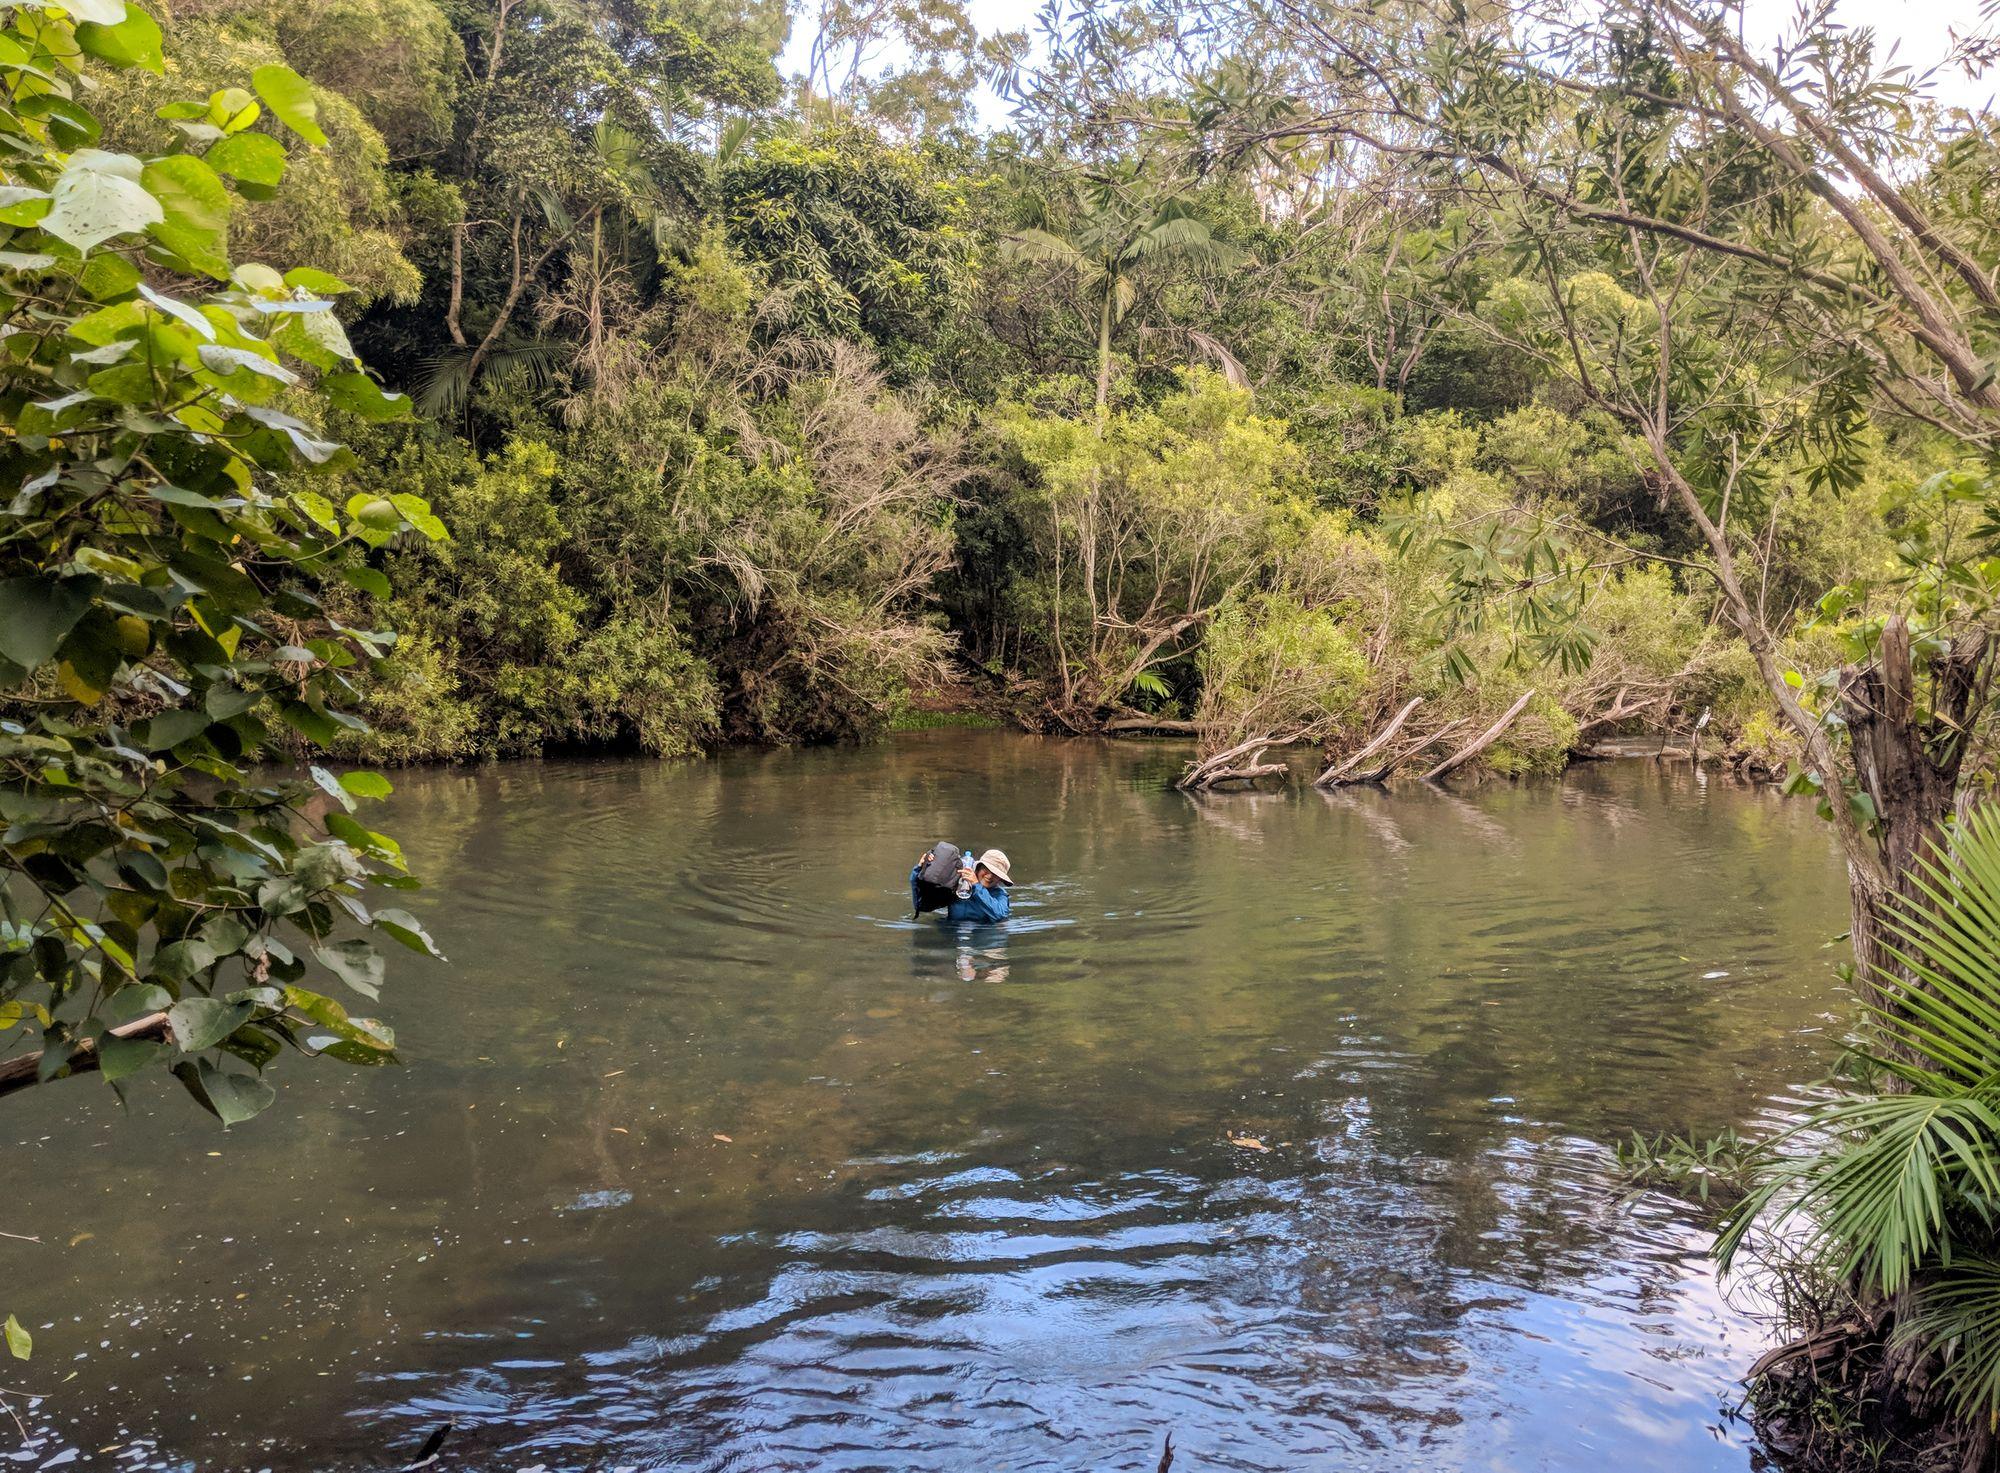 alligator creek falls track creek crossing